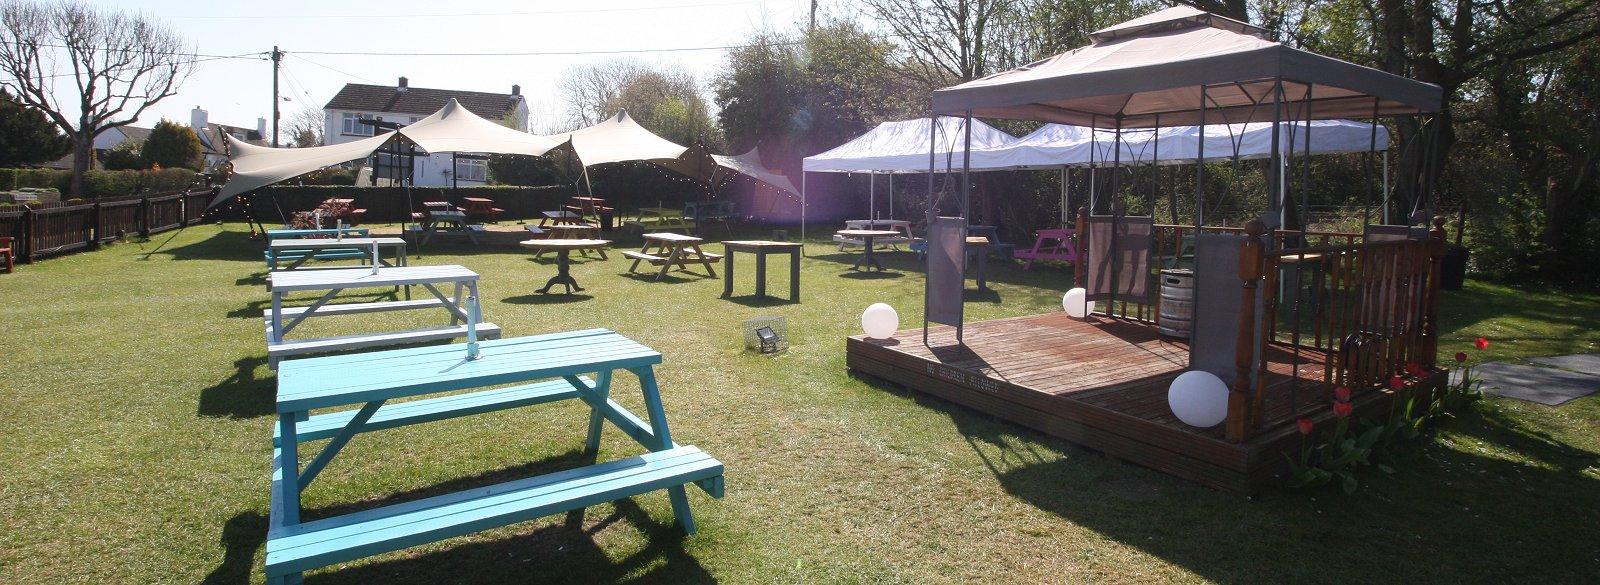 Pub Garden Swindon